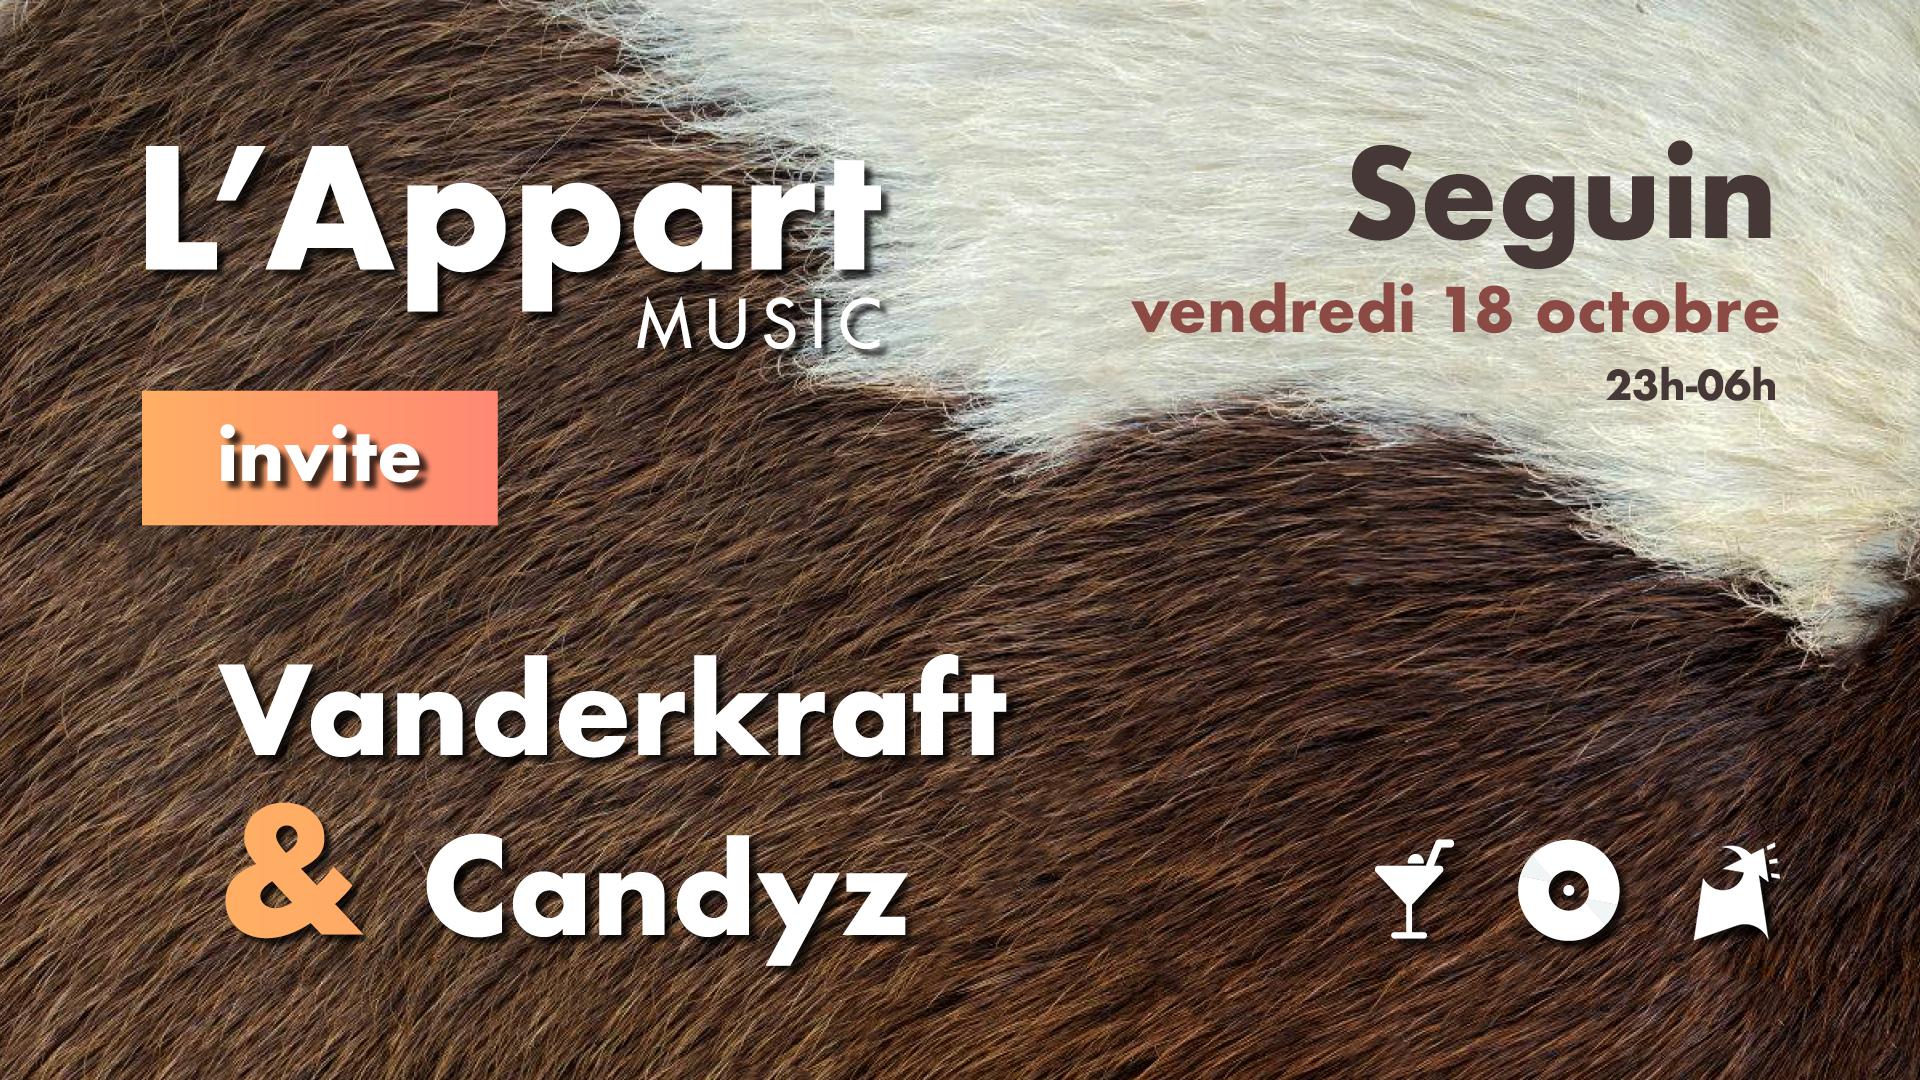 Seguin x L'Appart Music invitent : Vanderkraft & Candyz